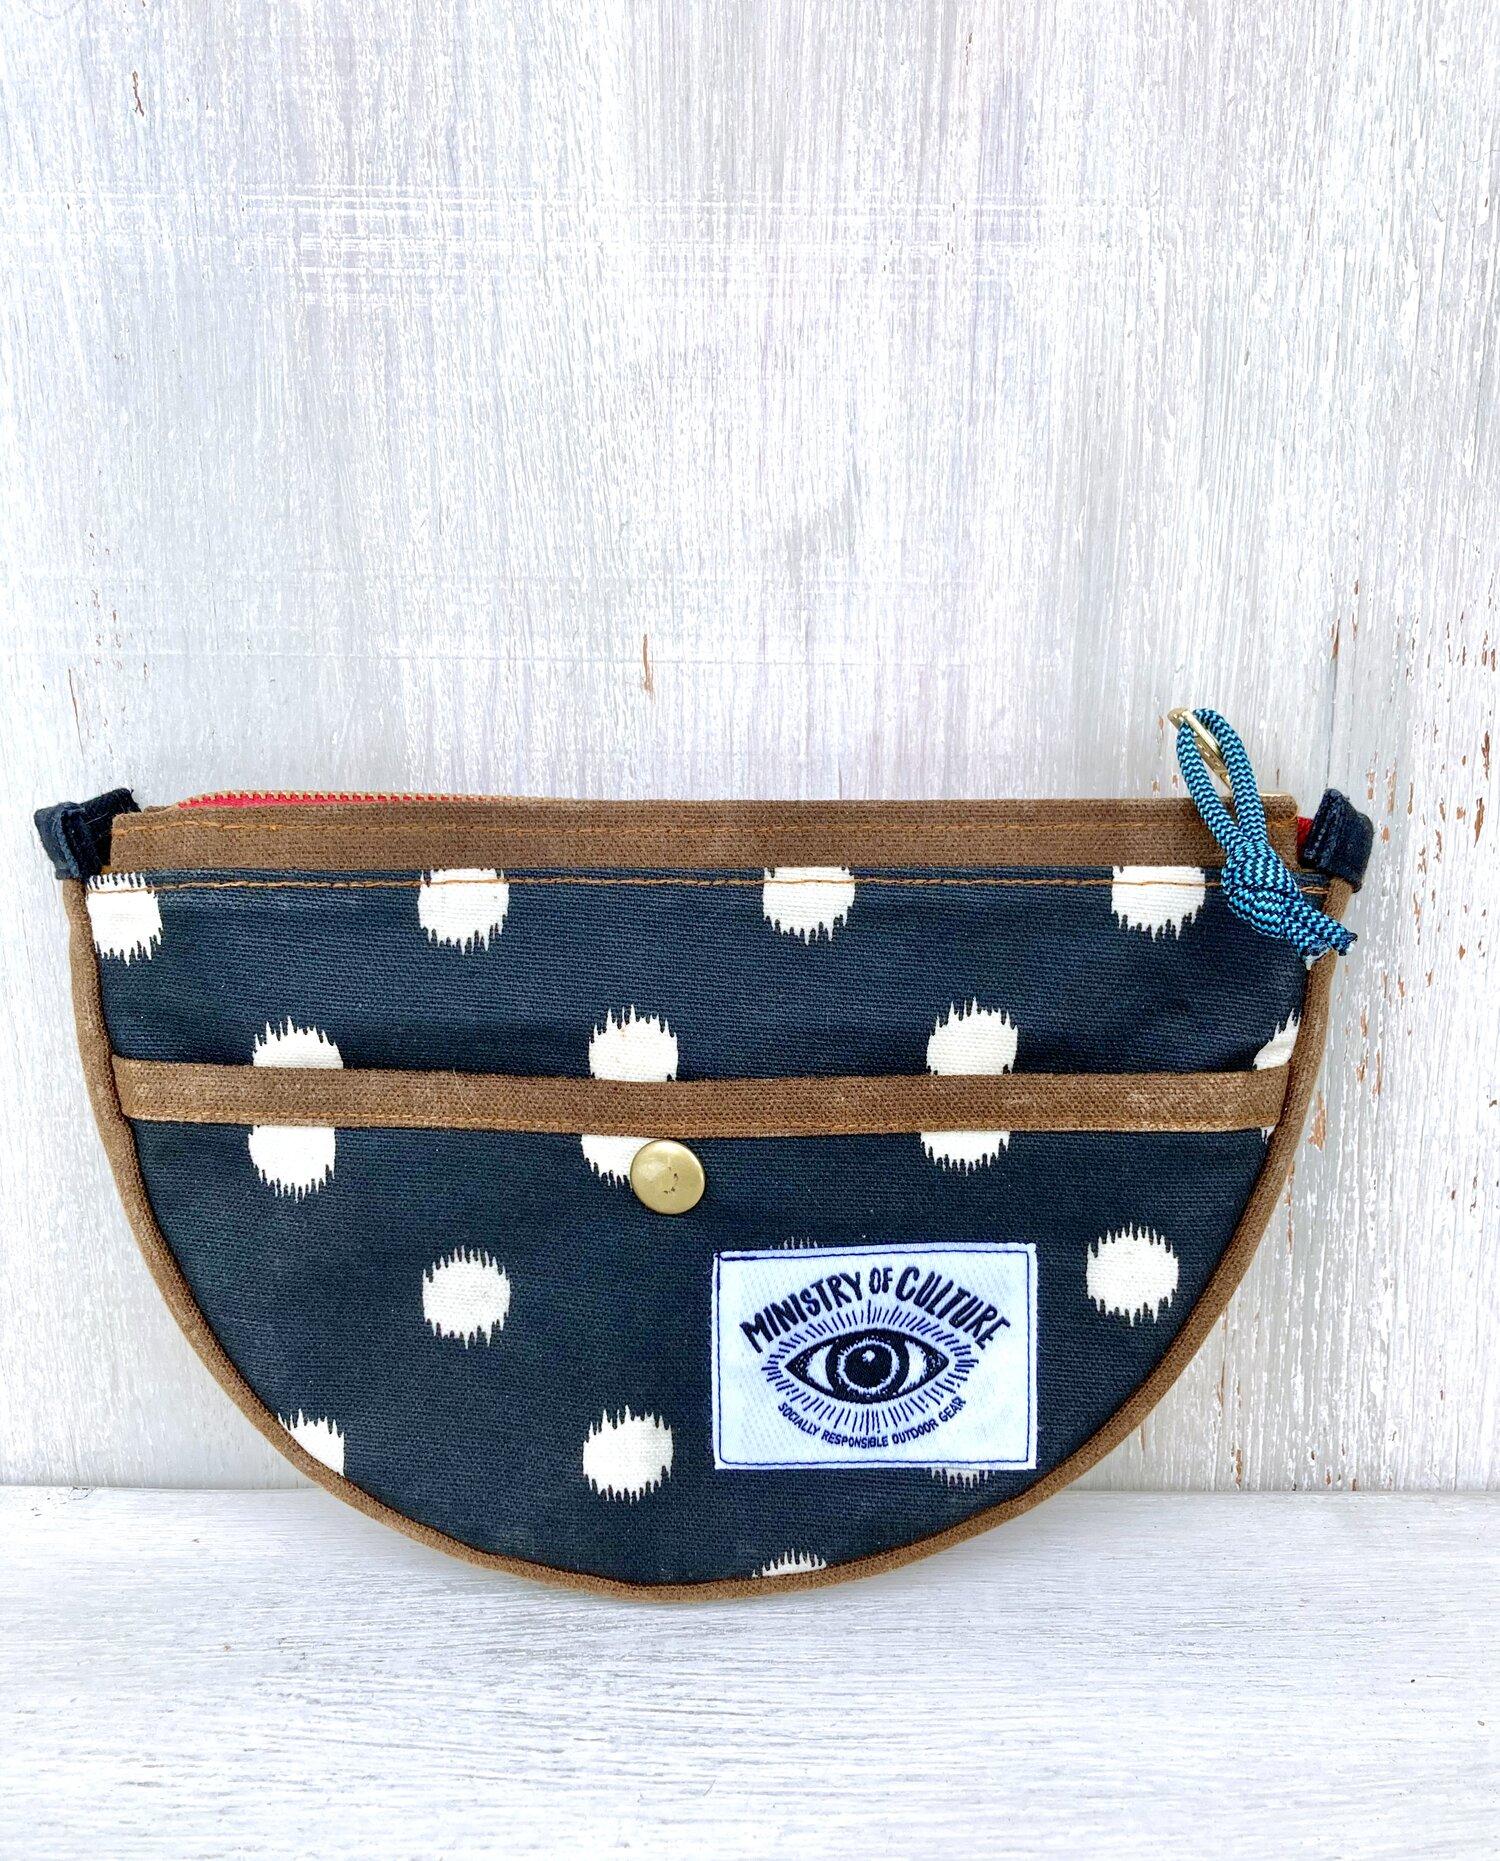 Festival bum bag Fanny pack with canvas design